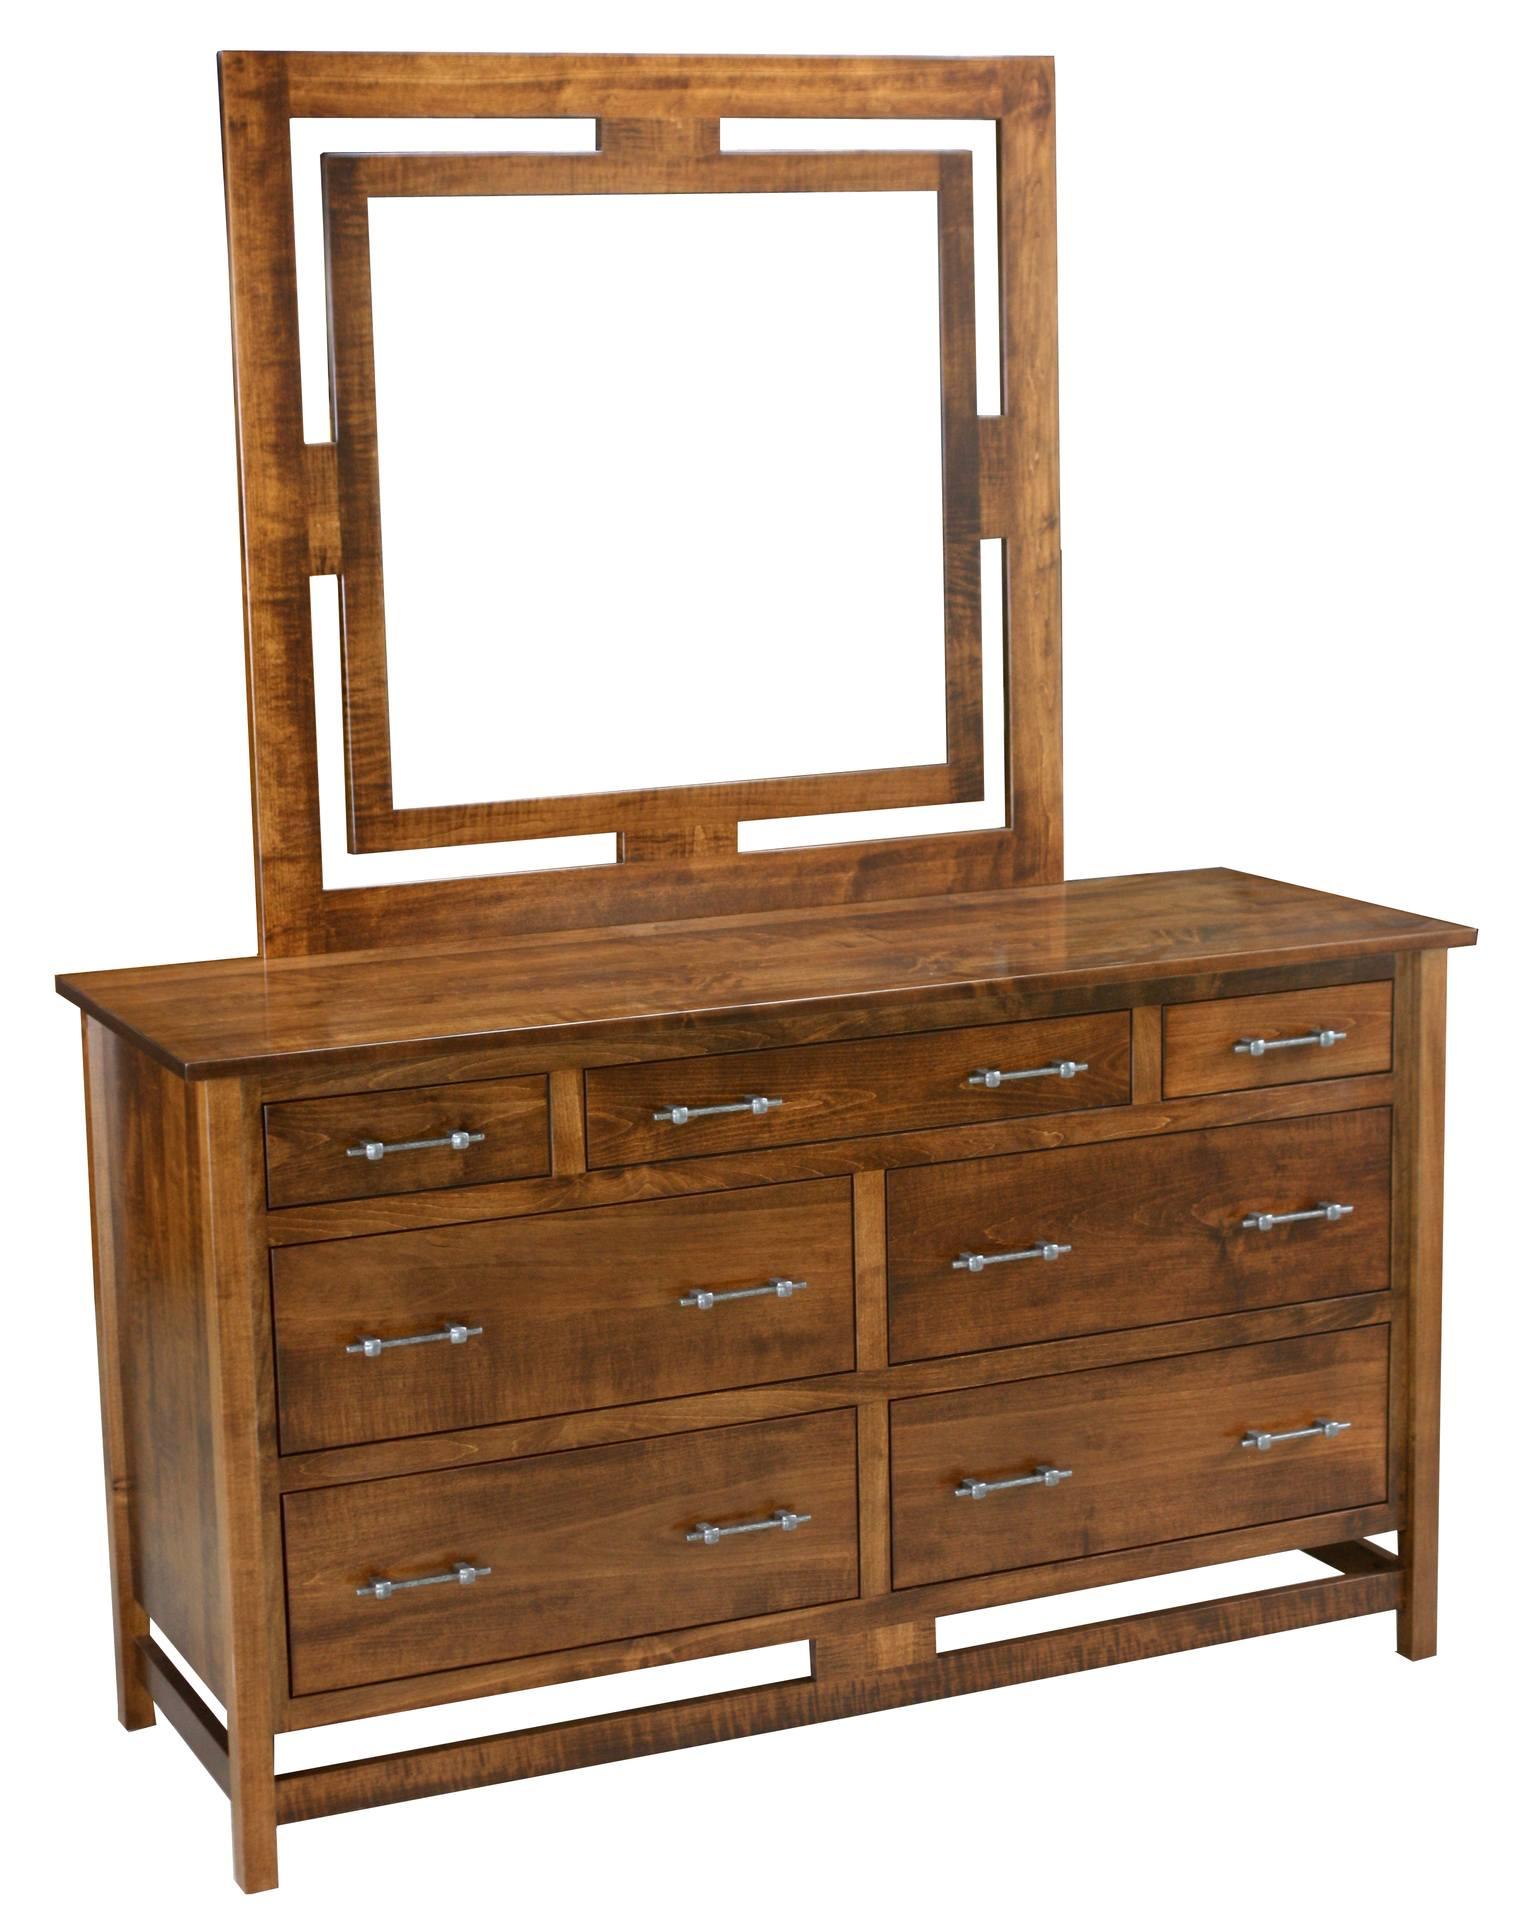 Lakota Seven Drawer Dresser and Mirror